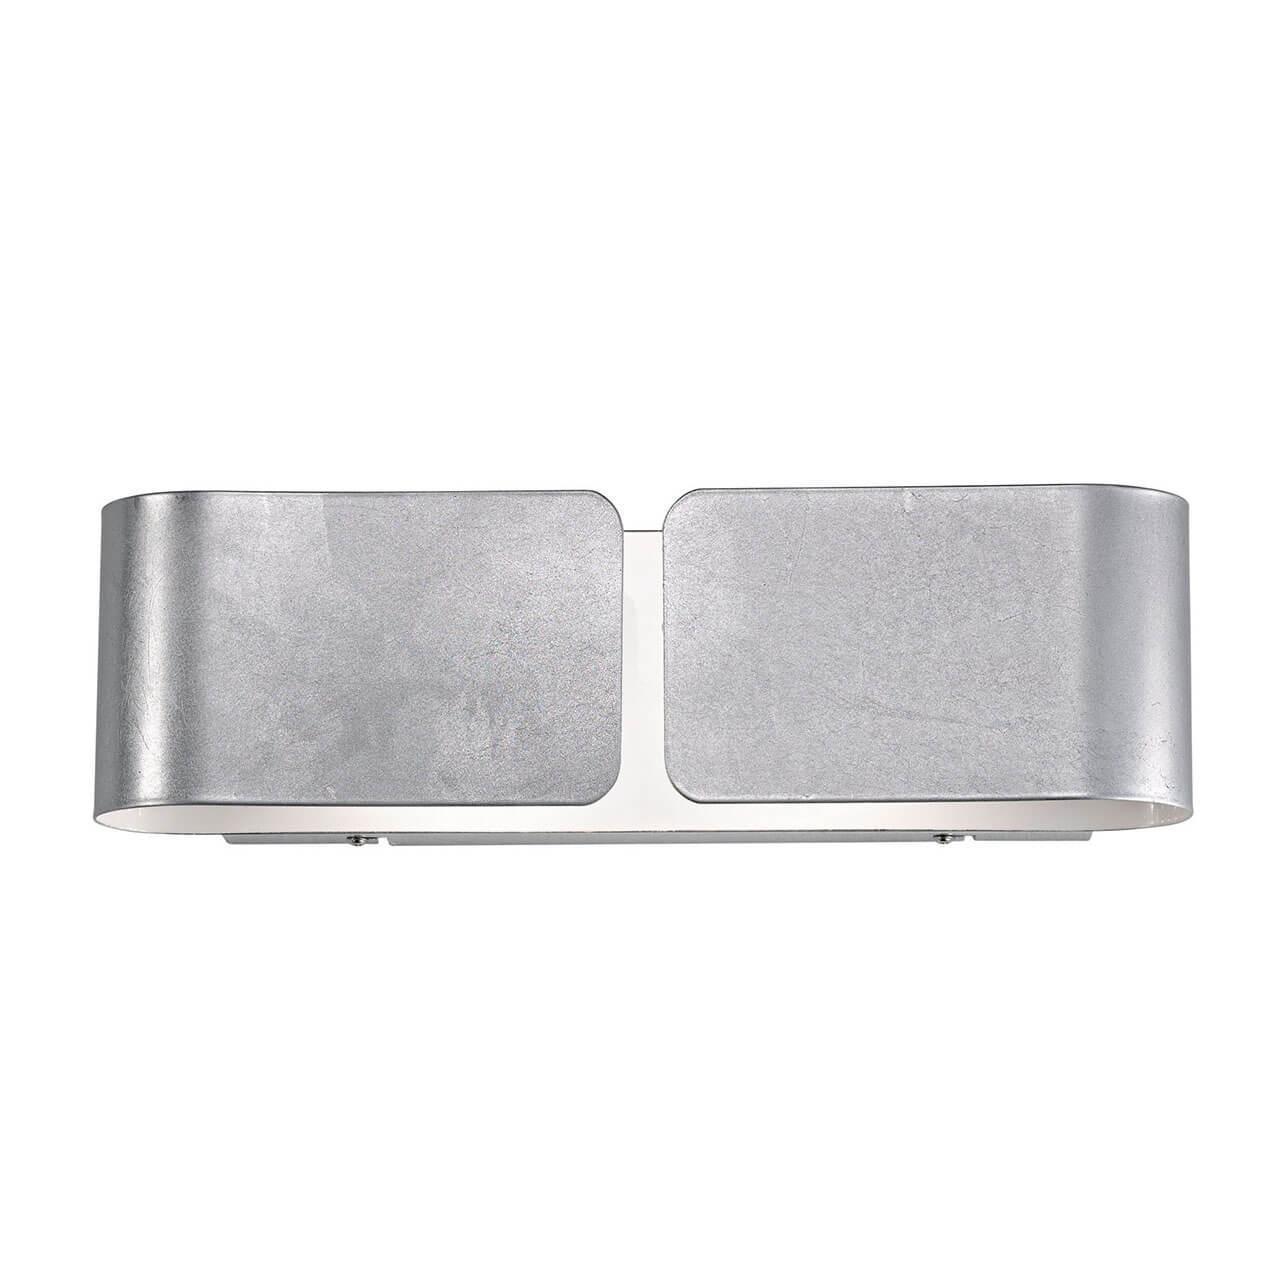 Фото - Настенный светильник Ideal Lux Clip AP2 Mini Argento, G9, 40 Вт потолочный светильник ideal lux pl6 g9 max 6 x 40w g9 вт